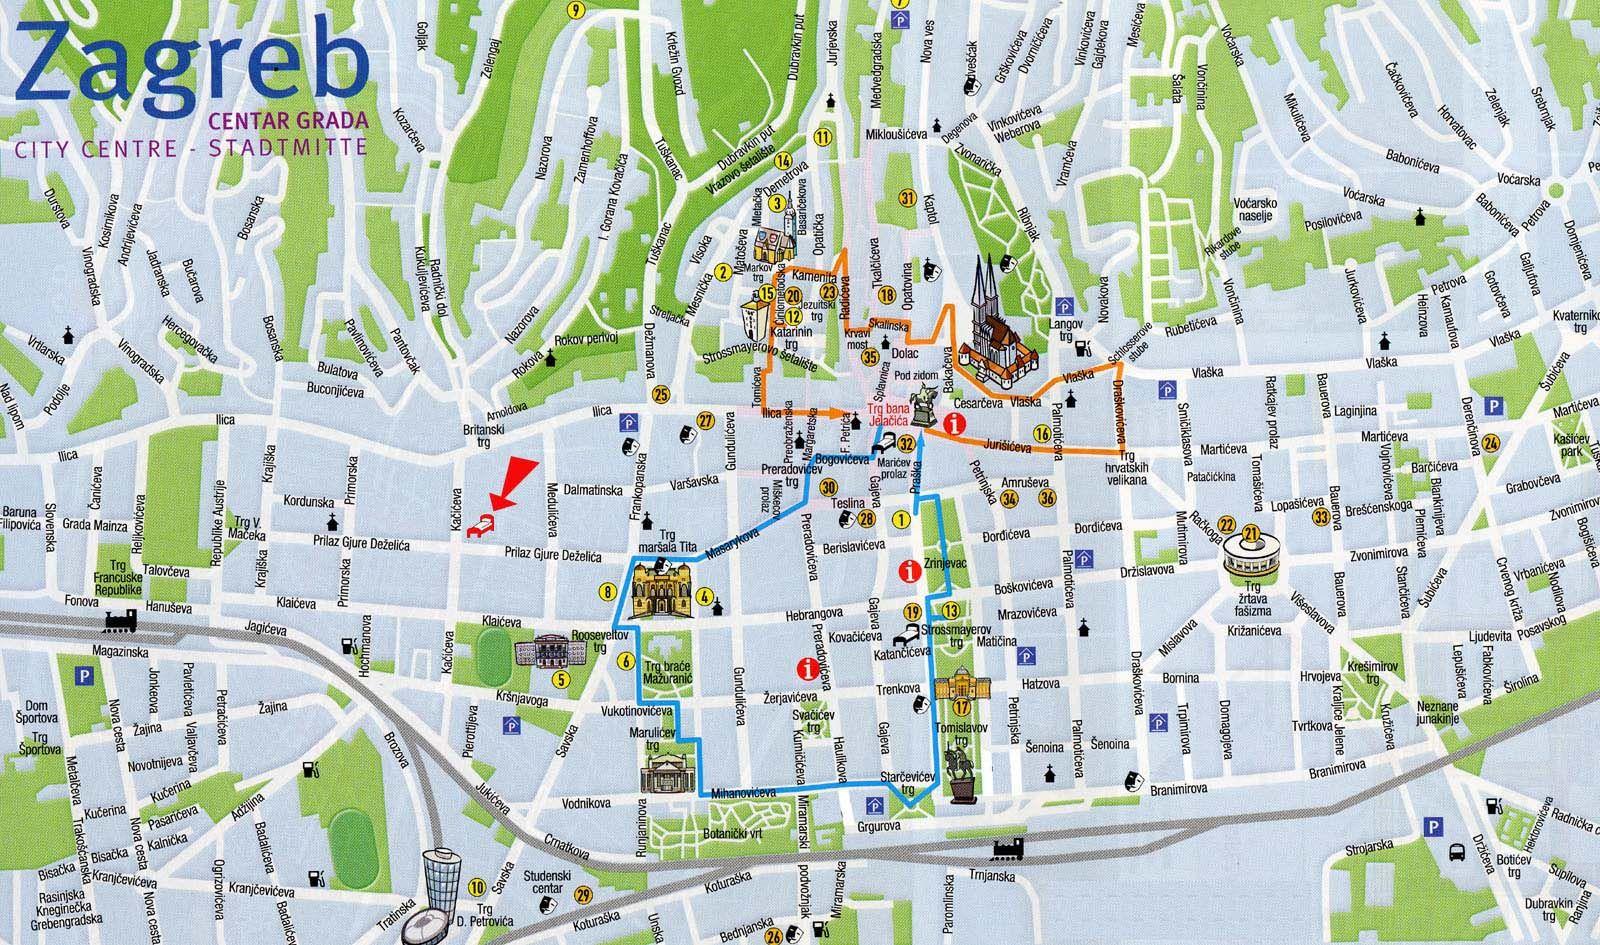 zagreb mapa Awesome Plan De Zagreb Gallery   Joshkrajcik.us   joshkrajcik.us zagreb mapa